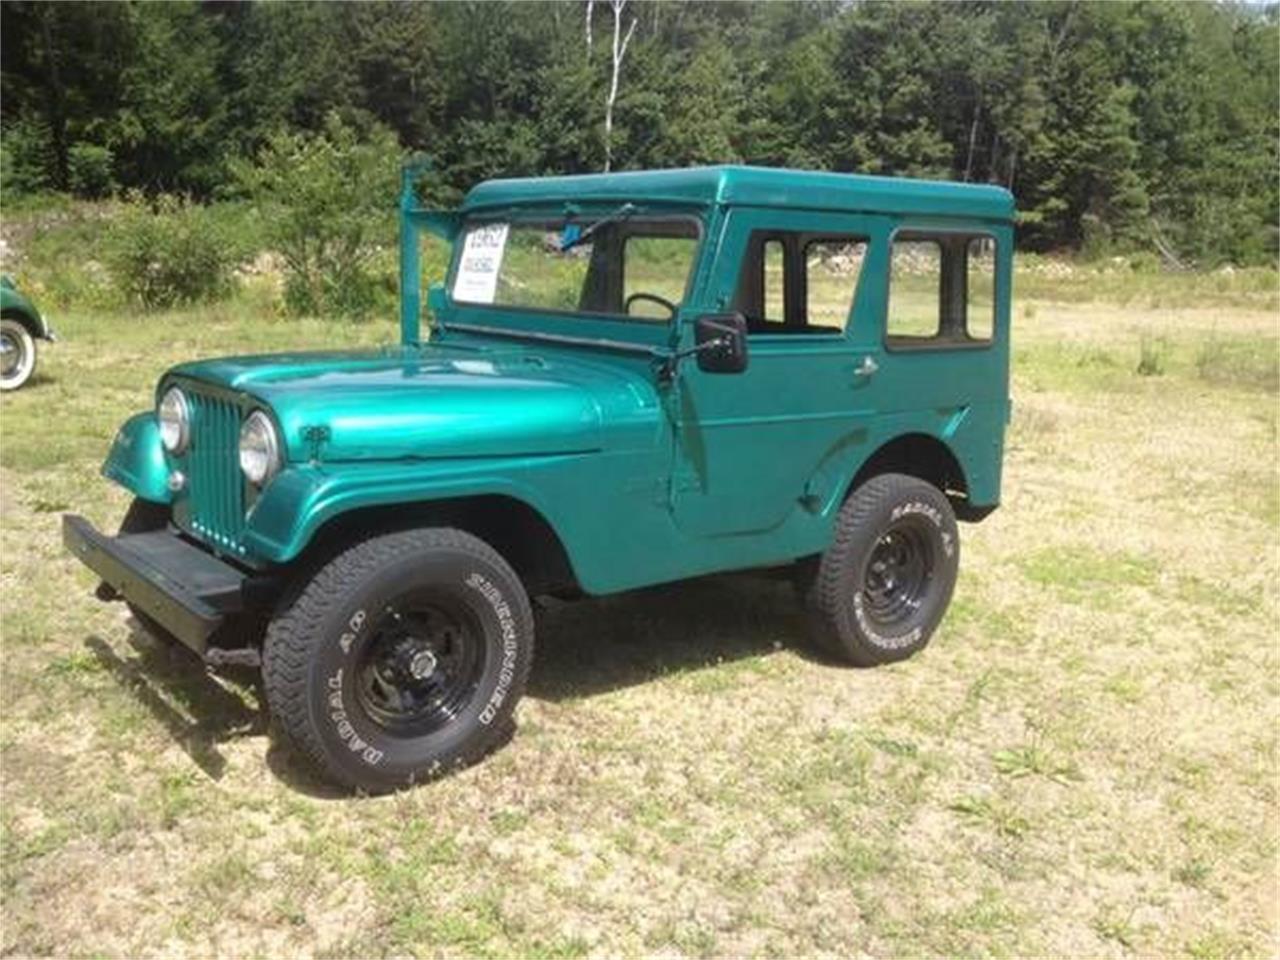 Large Picture of Classic '62 Jeep CJ7 located in Michigan - $9,995.00 - O0Q8